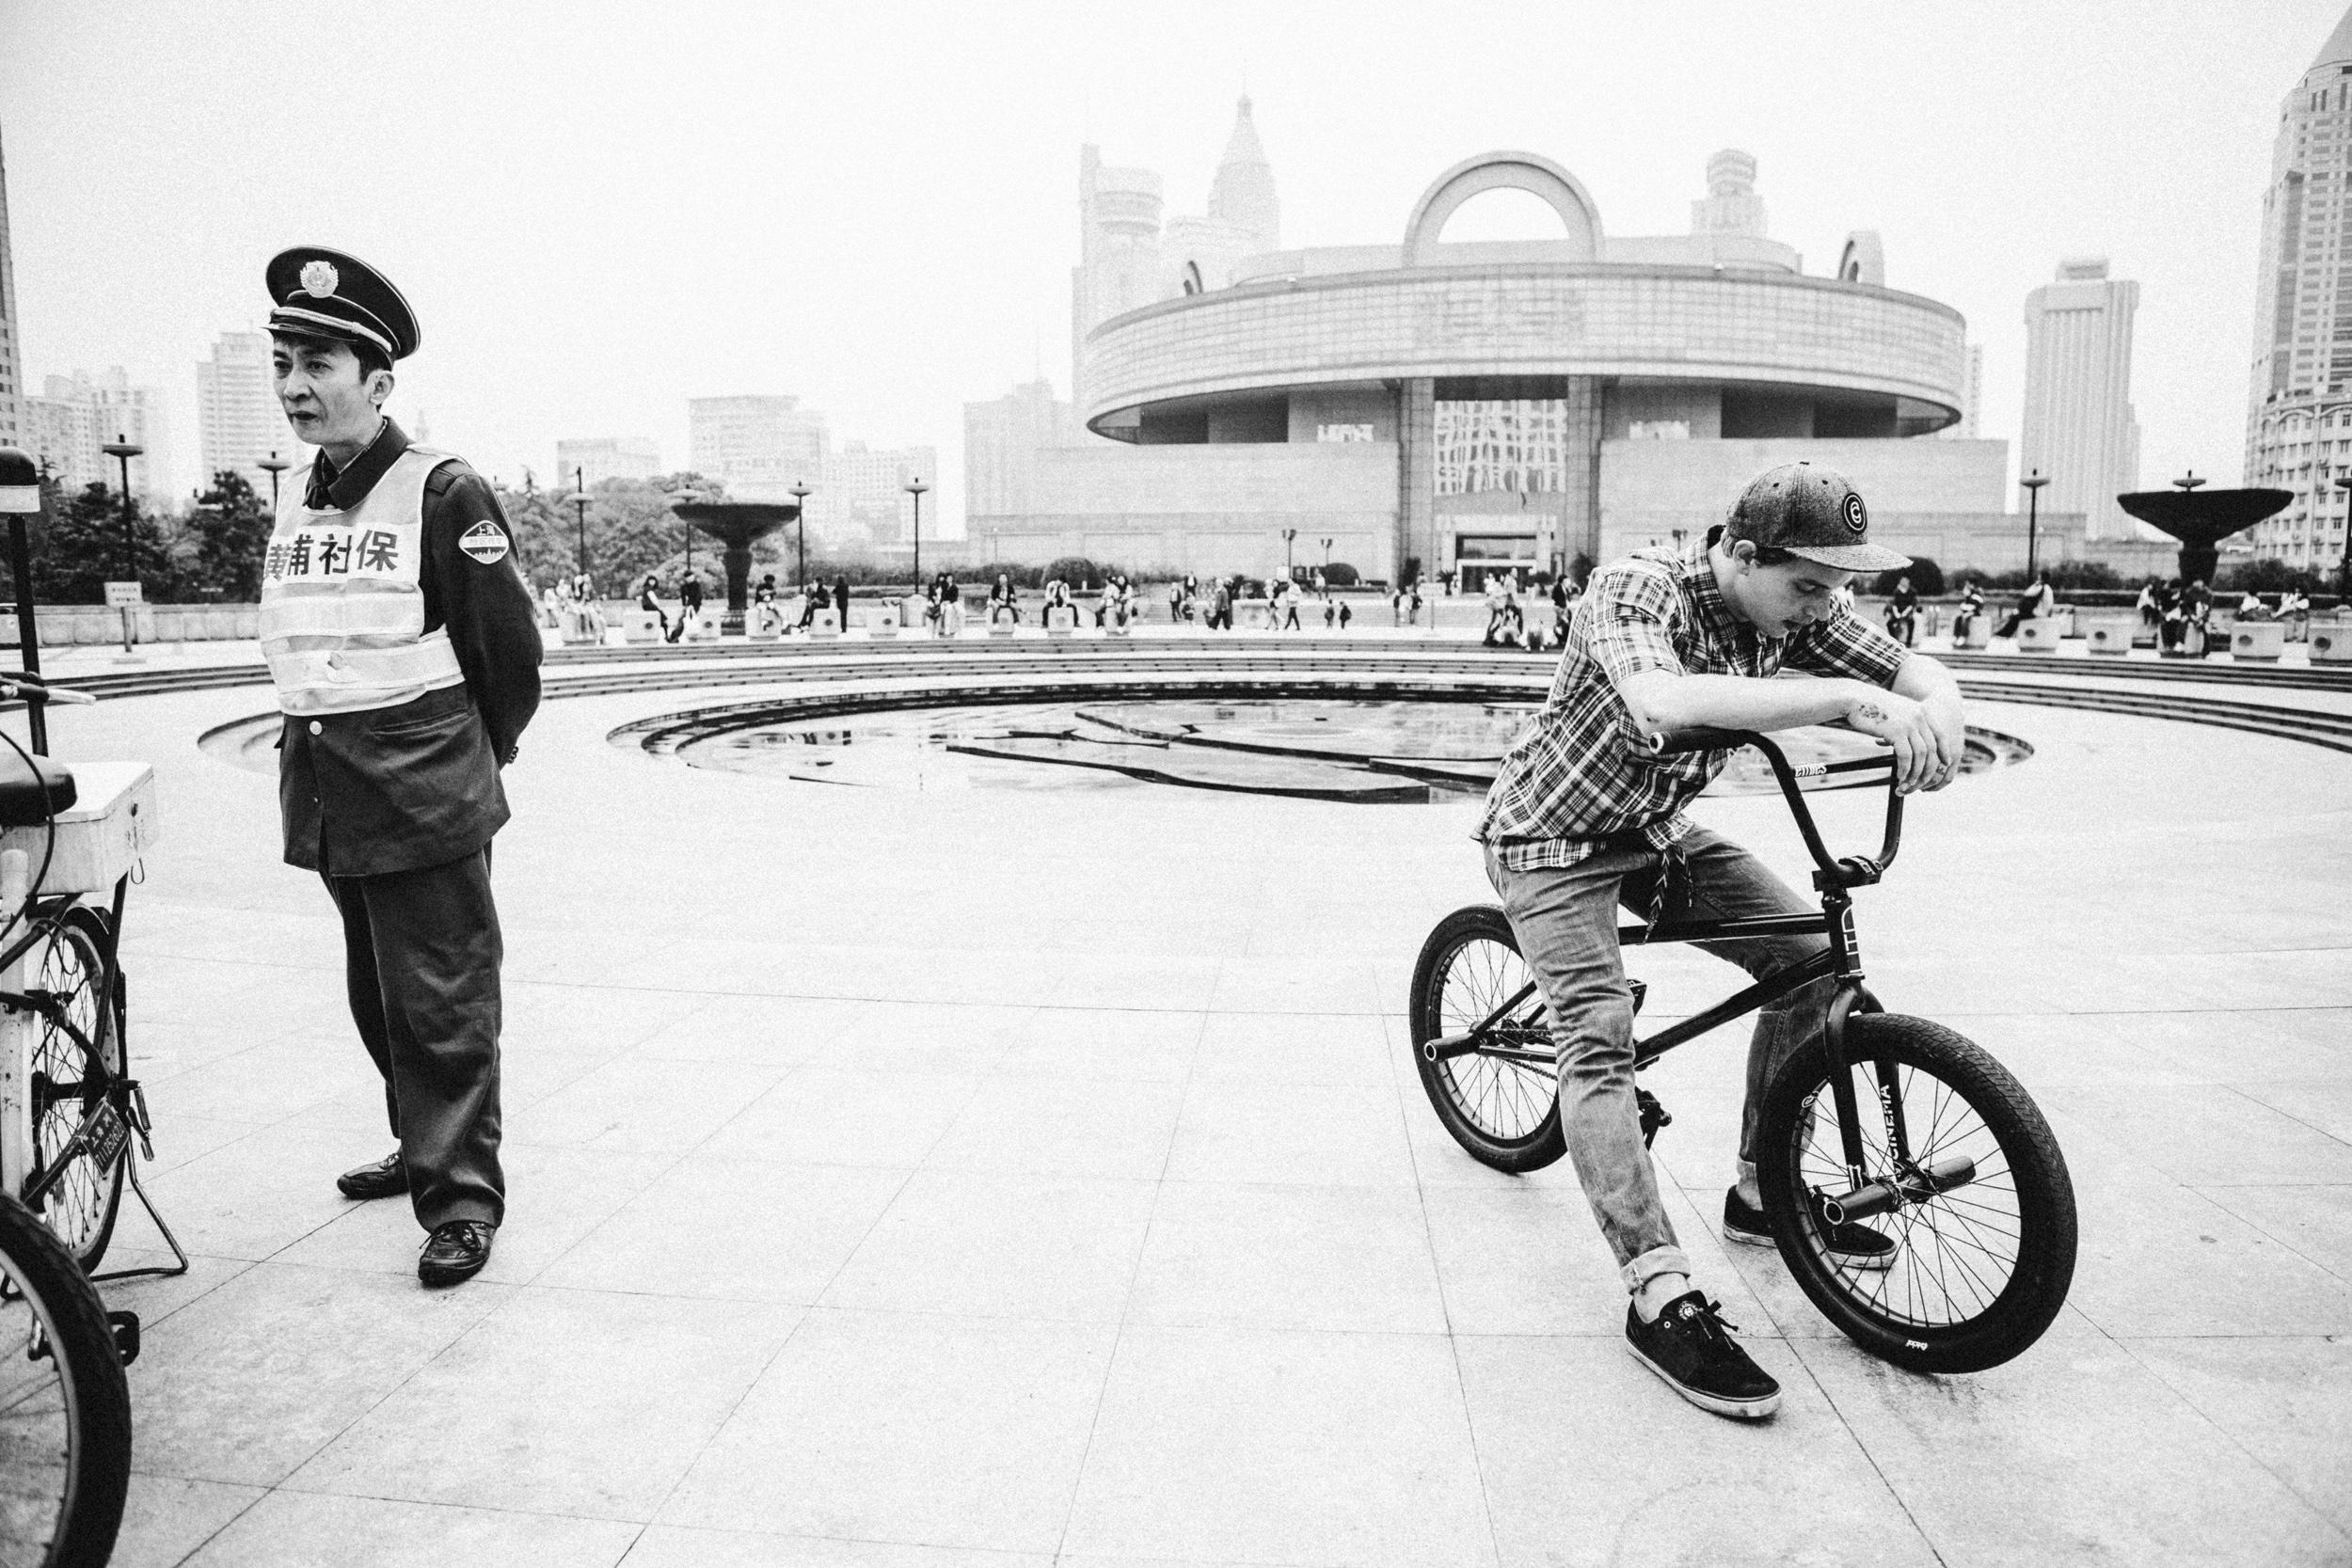 AndrewWhite_Shanghai-12.JPG